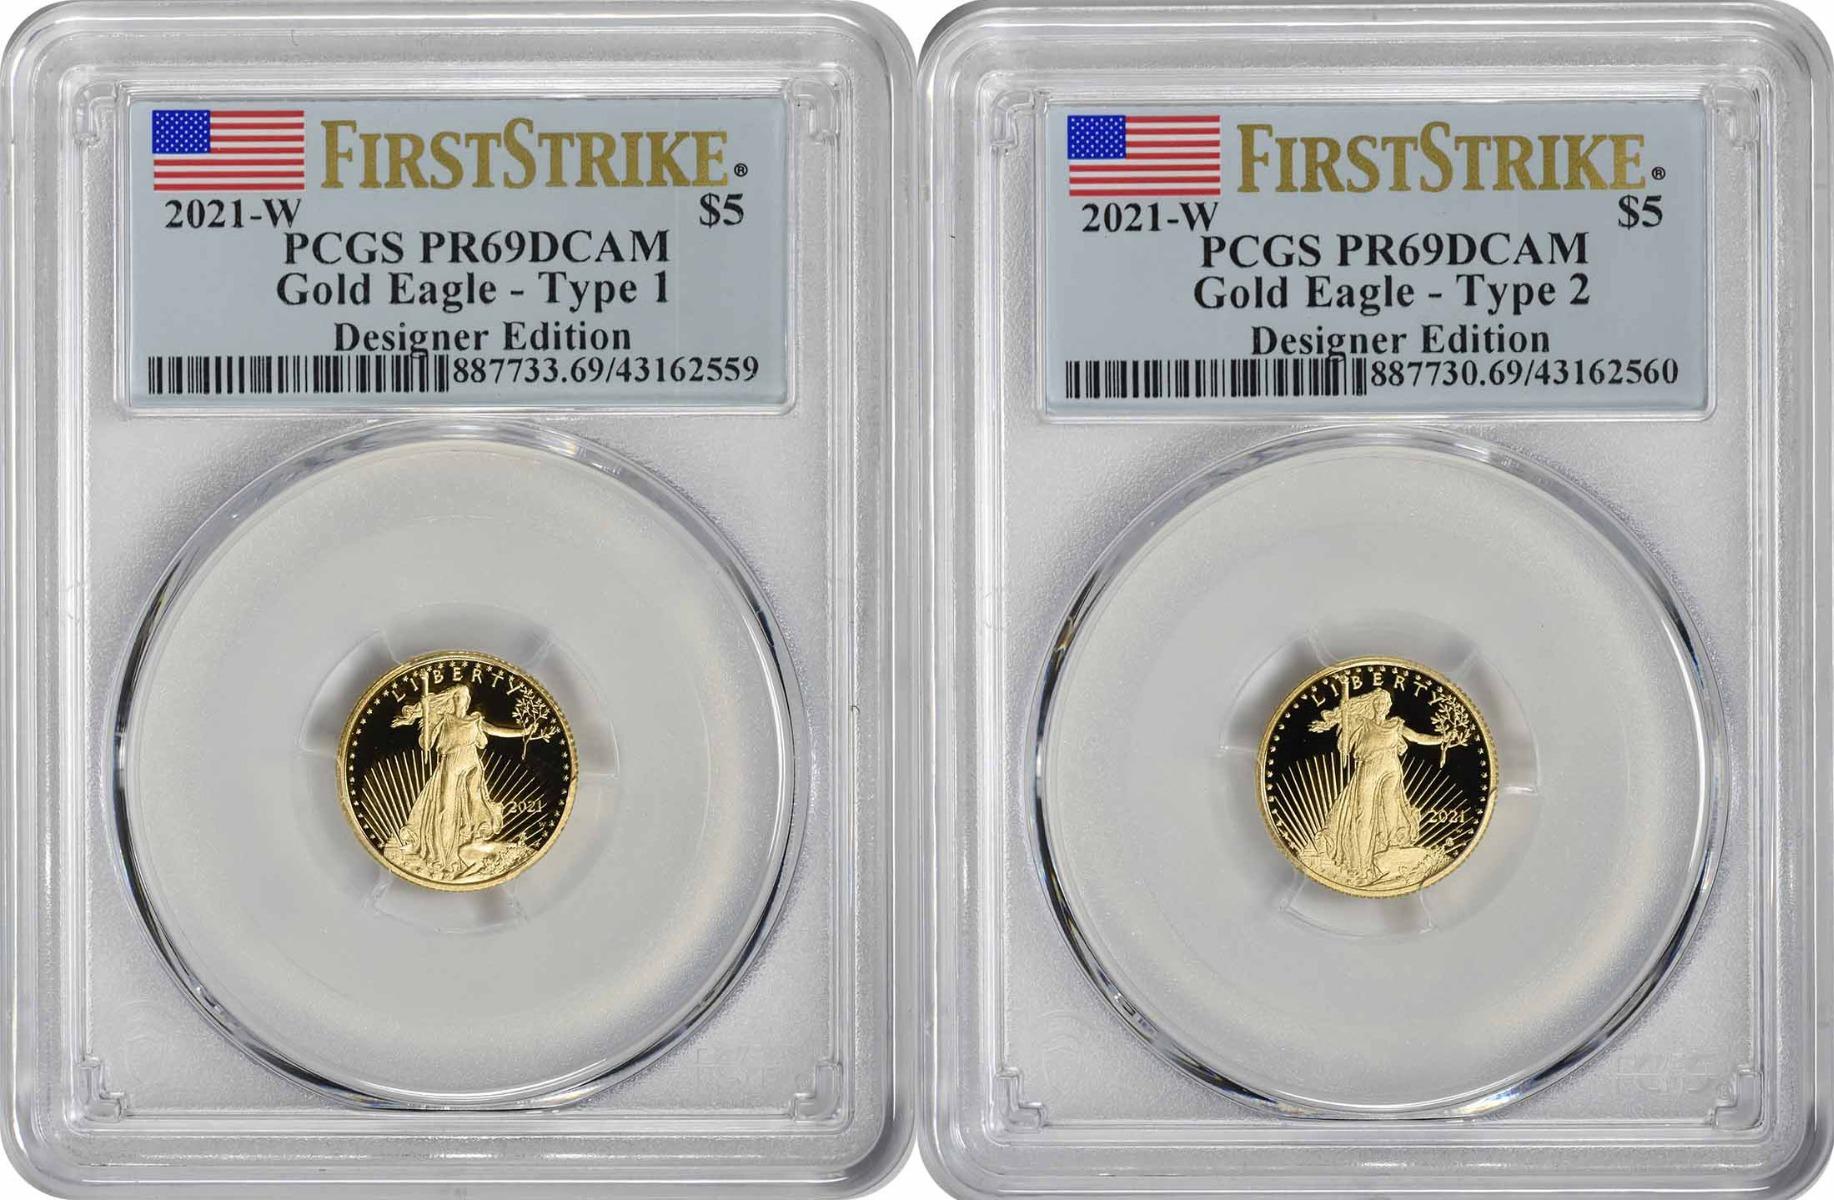 2021-W $5 American Gold Eagle Designer Edition 2-Coin Set PR69DCAM First Strike PCGS